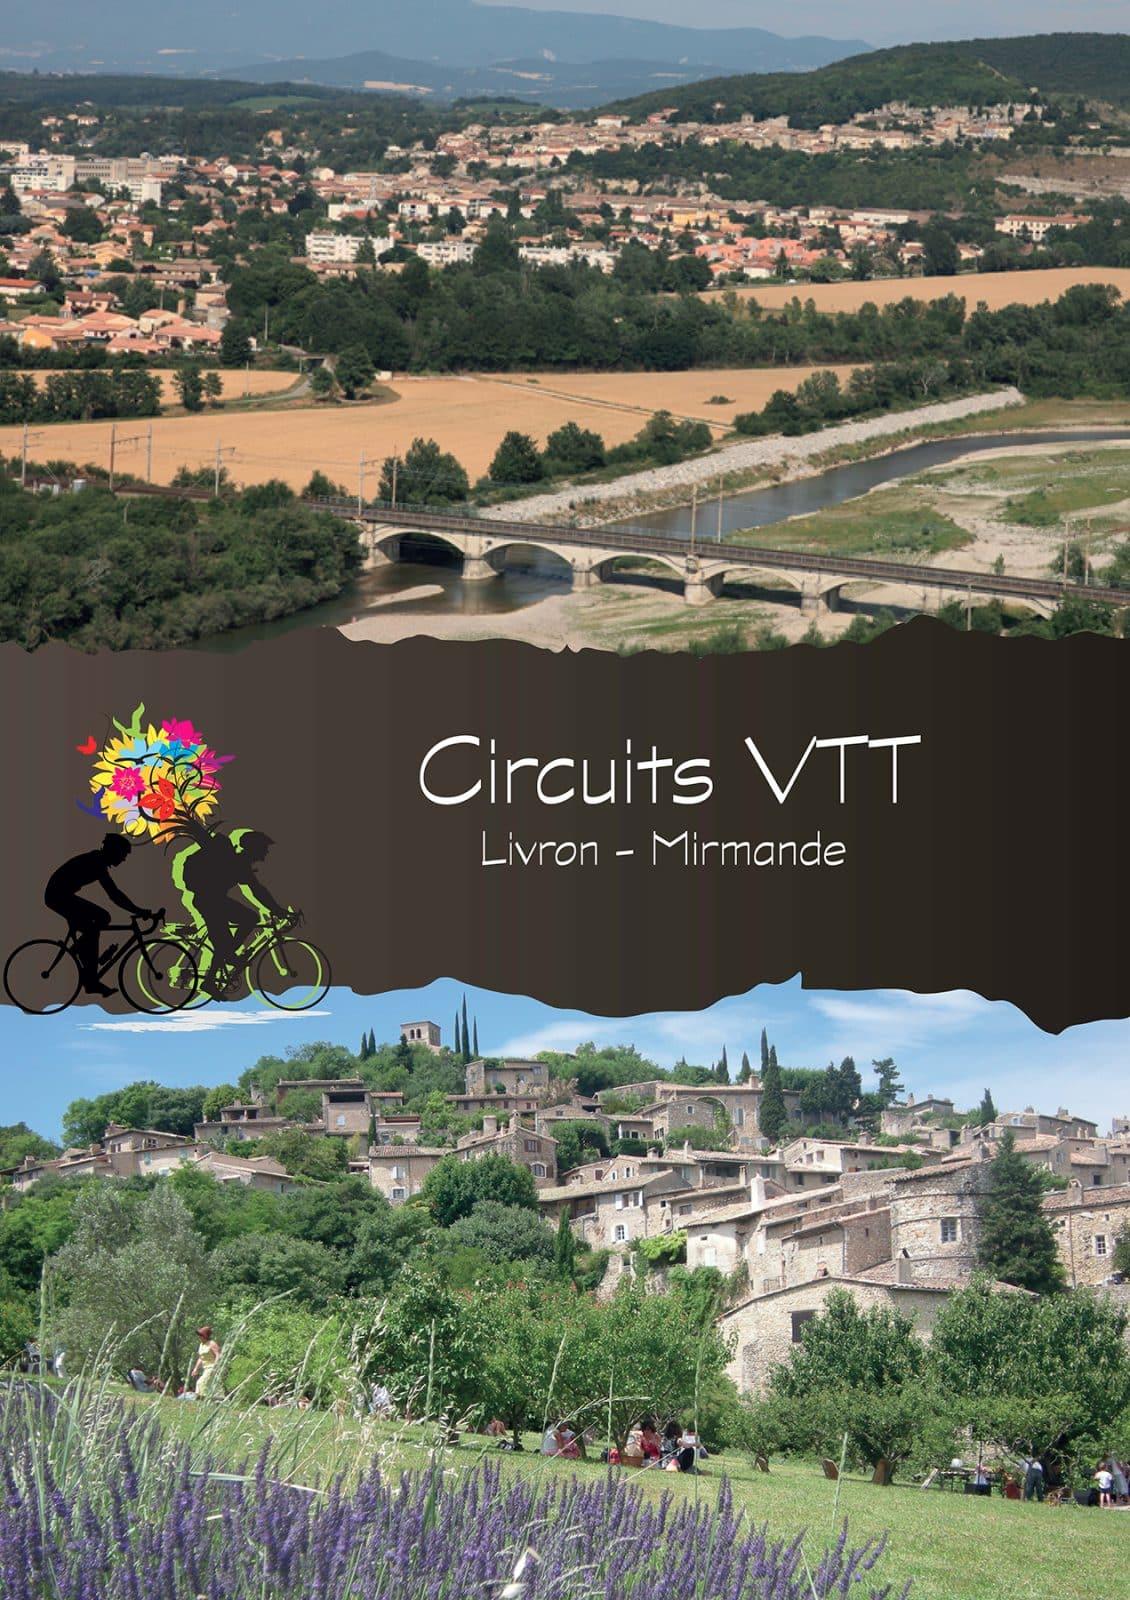 Couverture pochette Circuits VTT – Livron-Mirmande